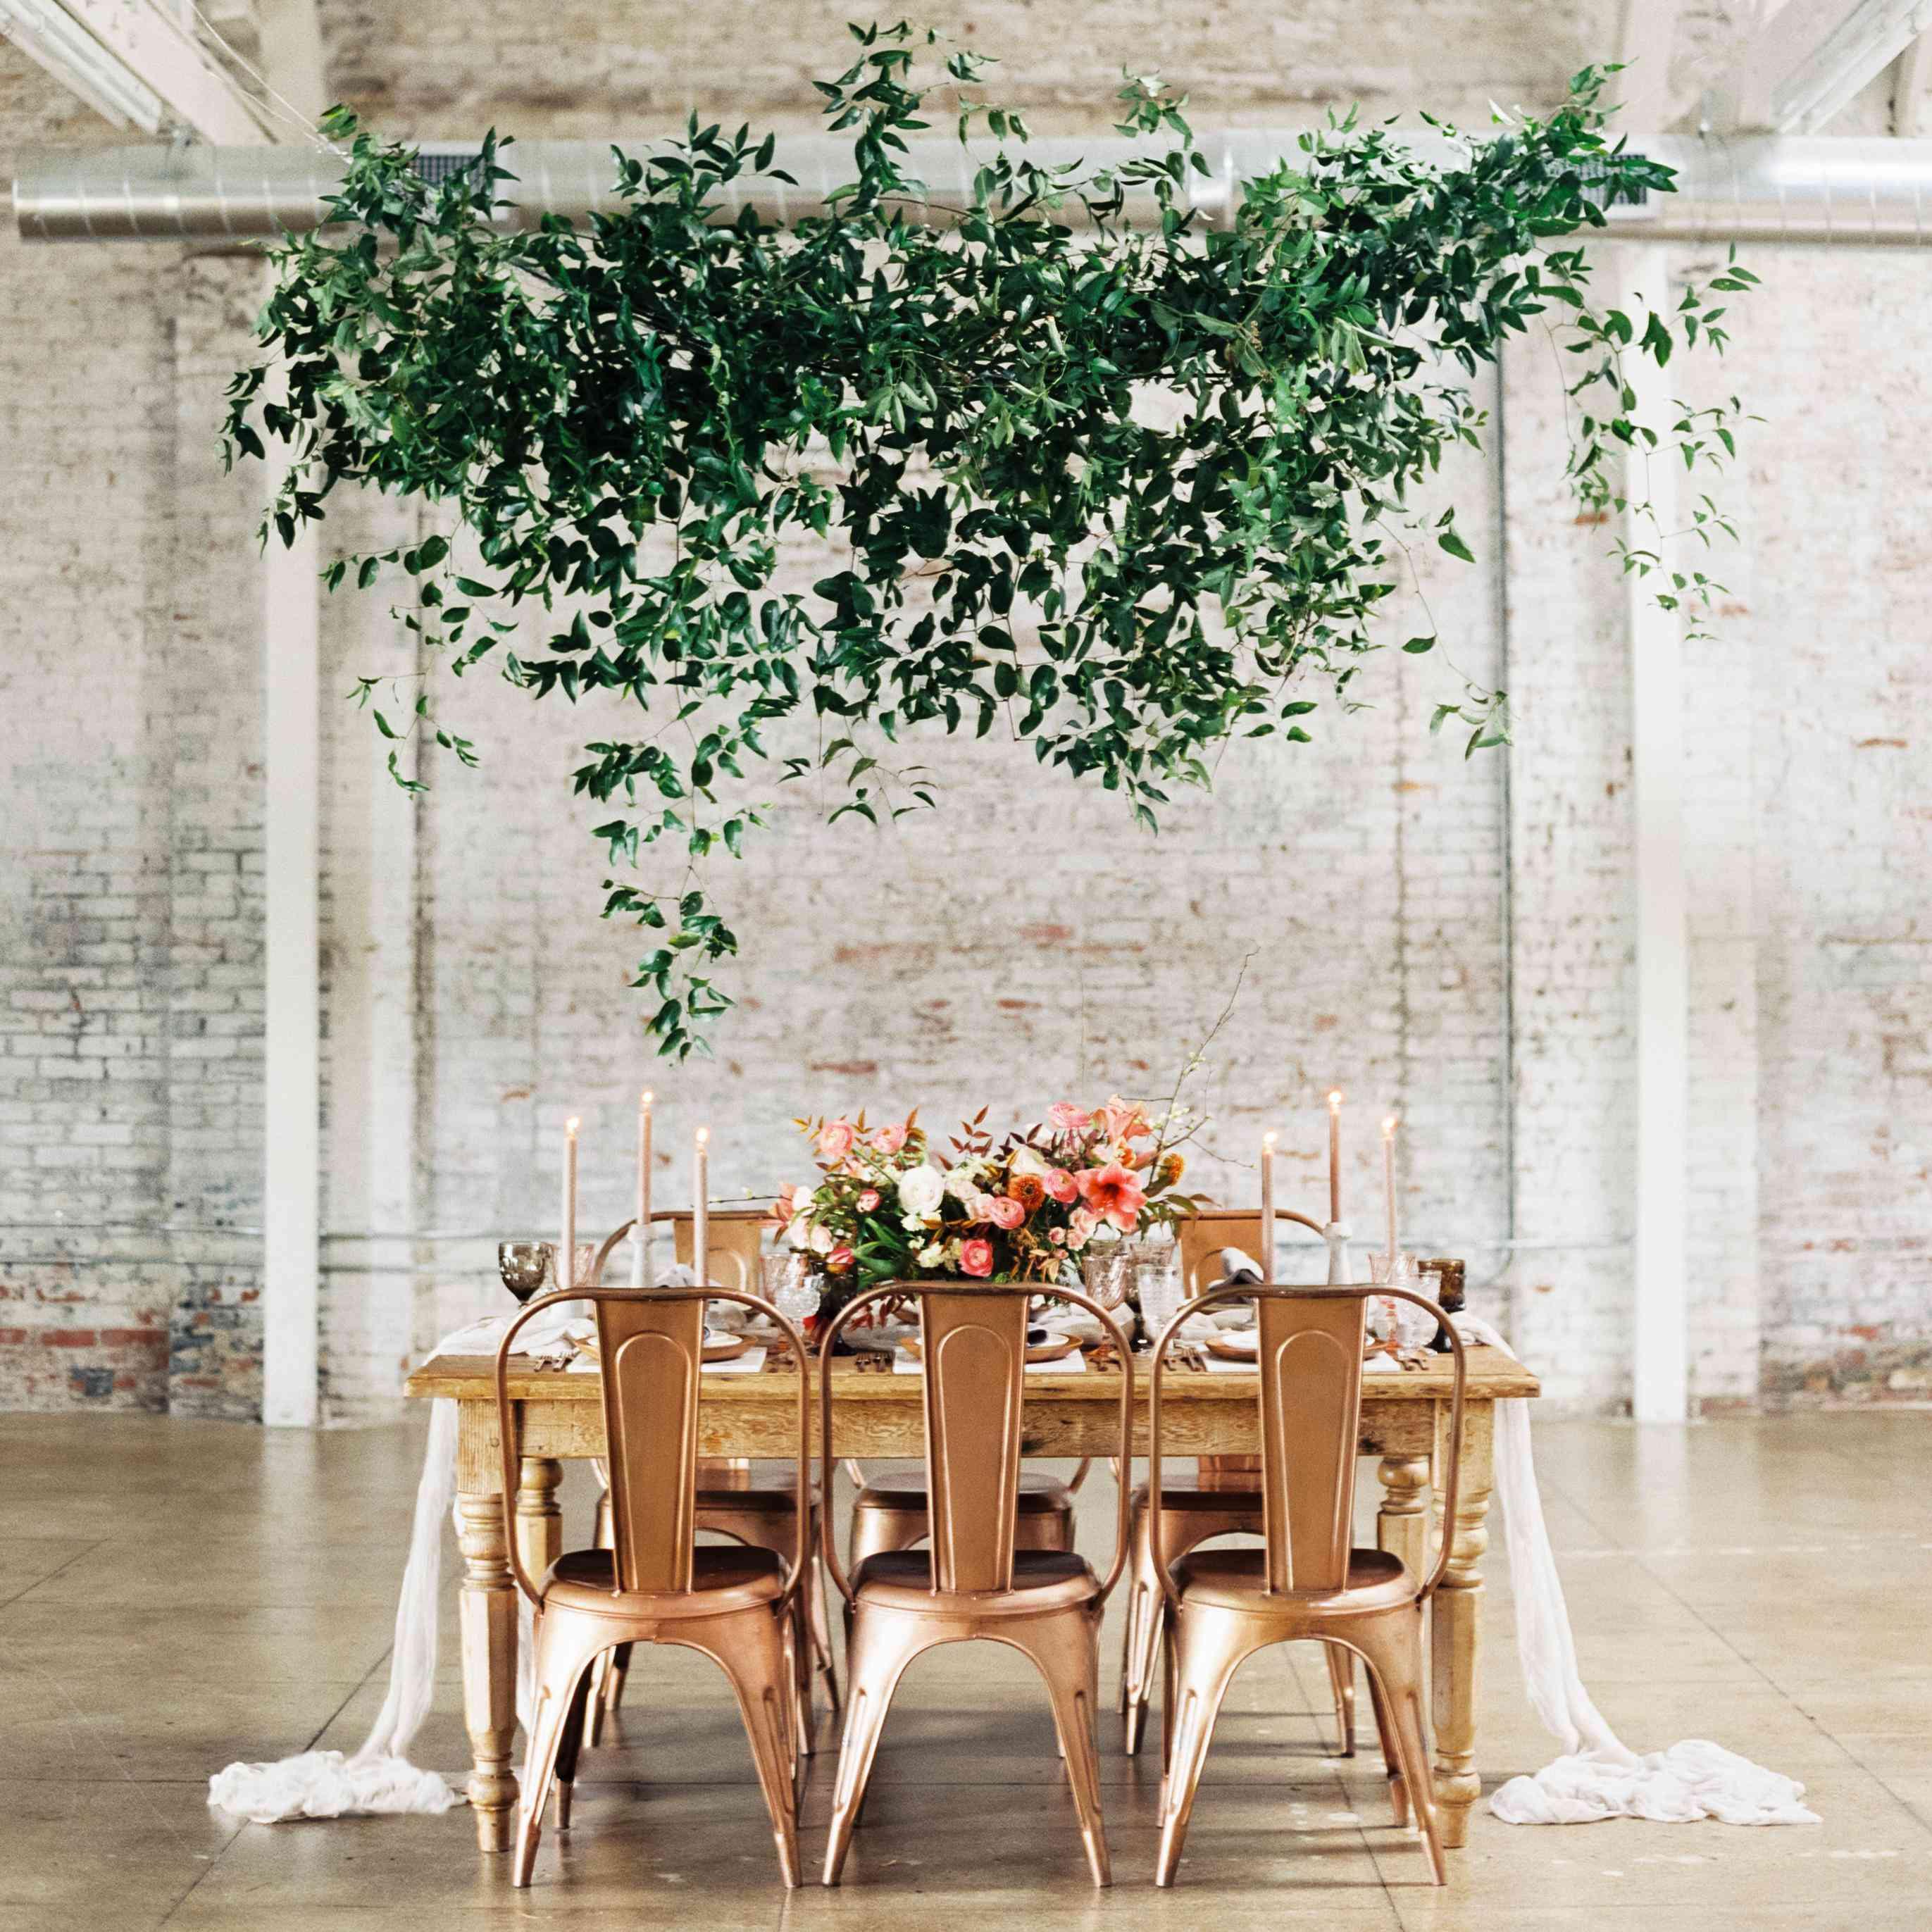 Outdoor November Wedding Flowers: Amazing Hanging Greenery Installations For Your Wedding